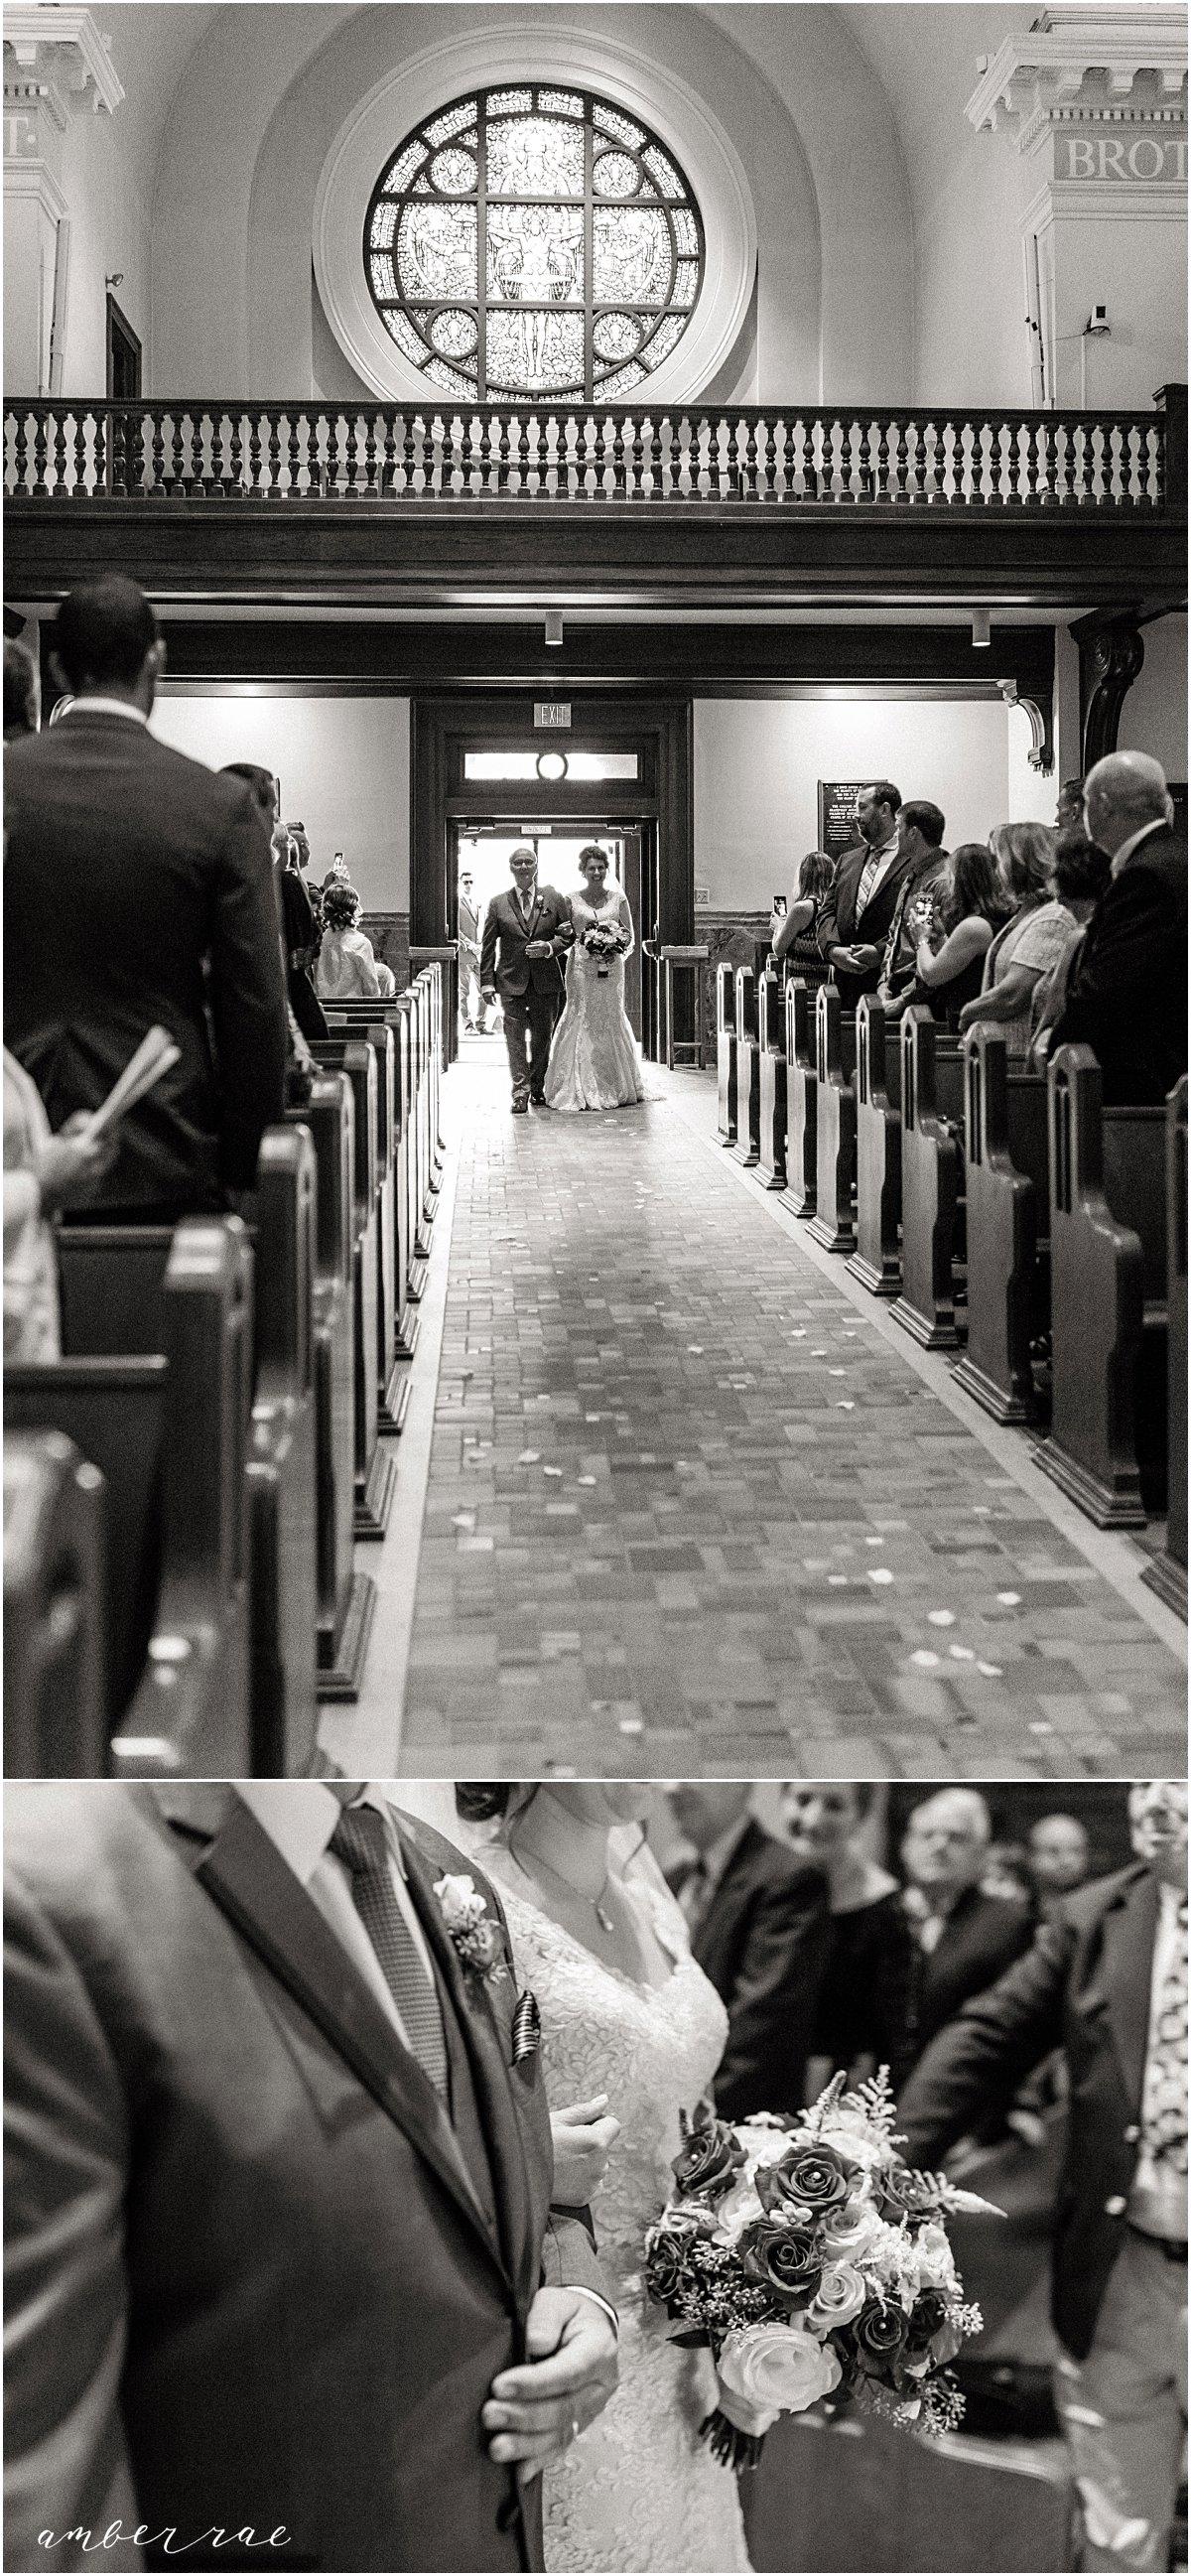 Gustafson Wedding 2018_0016.jpg